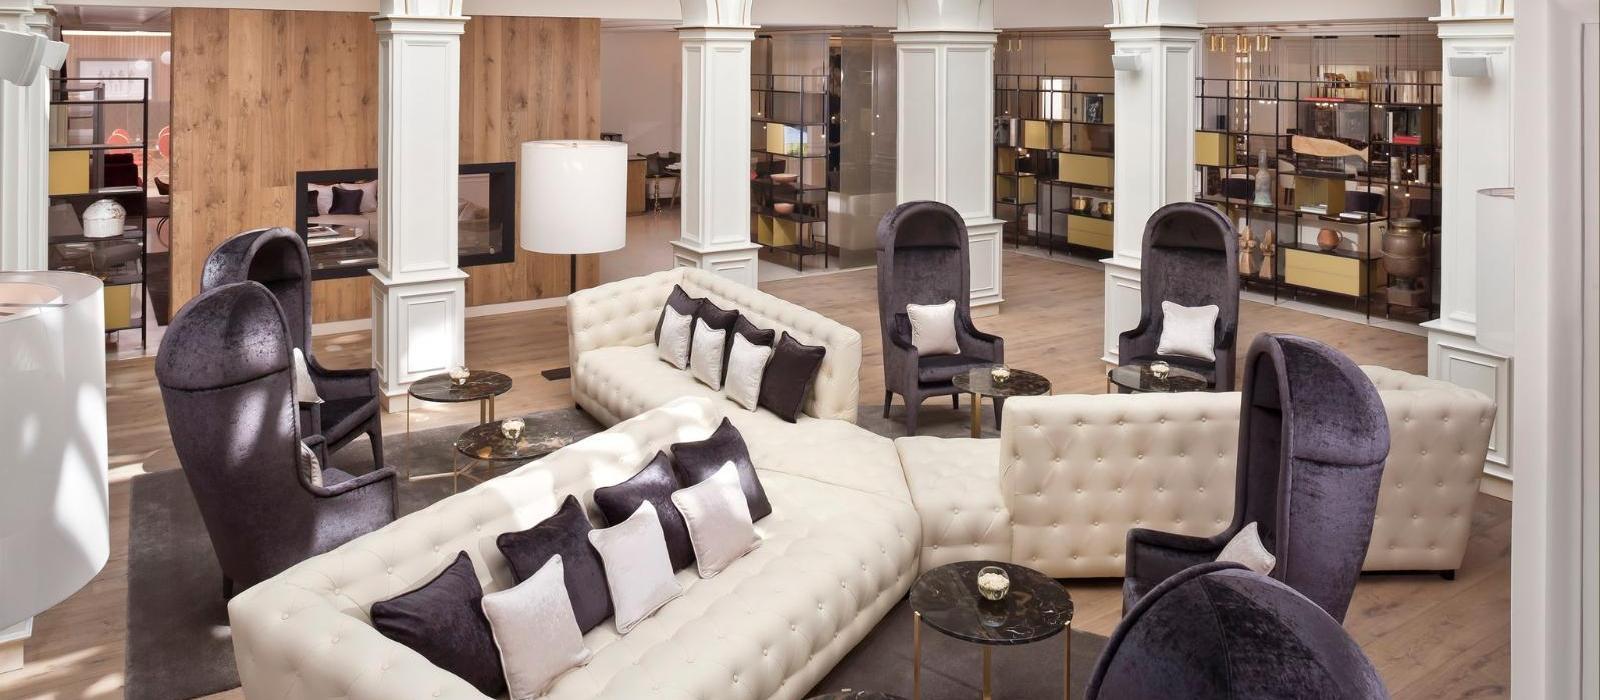 盛美利亚公爵皇宫酒店(Gran Melia Palacio de Los Duques) 图片  www.lhw.cn